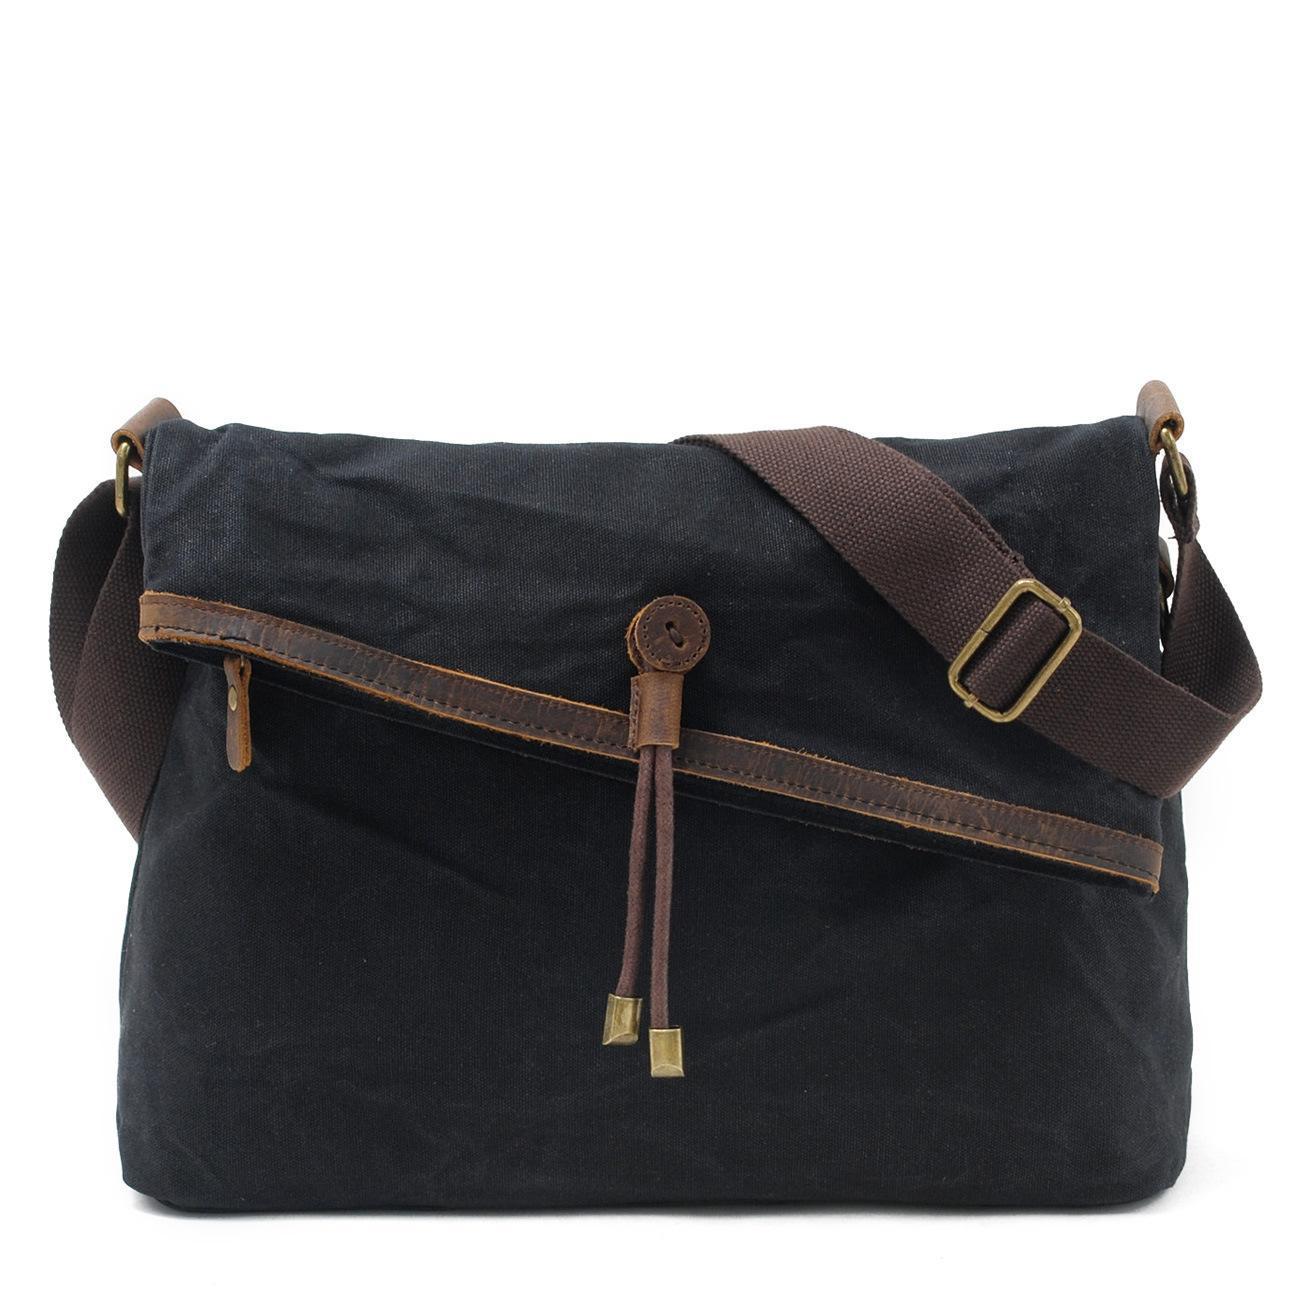 e562e347e5 Newest Design Black Color Waterproof Canvas School Satchel Bag (RS-9121-F)